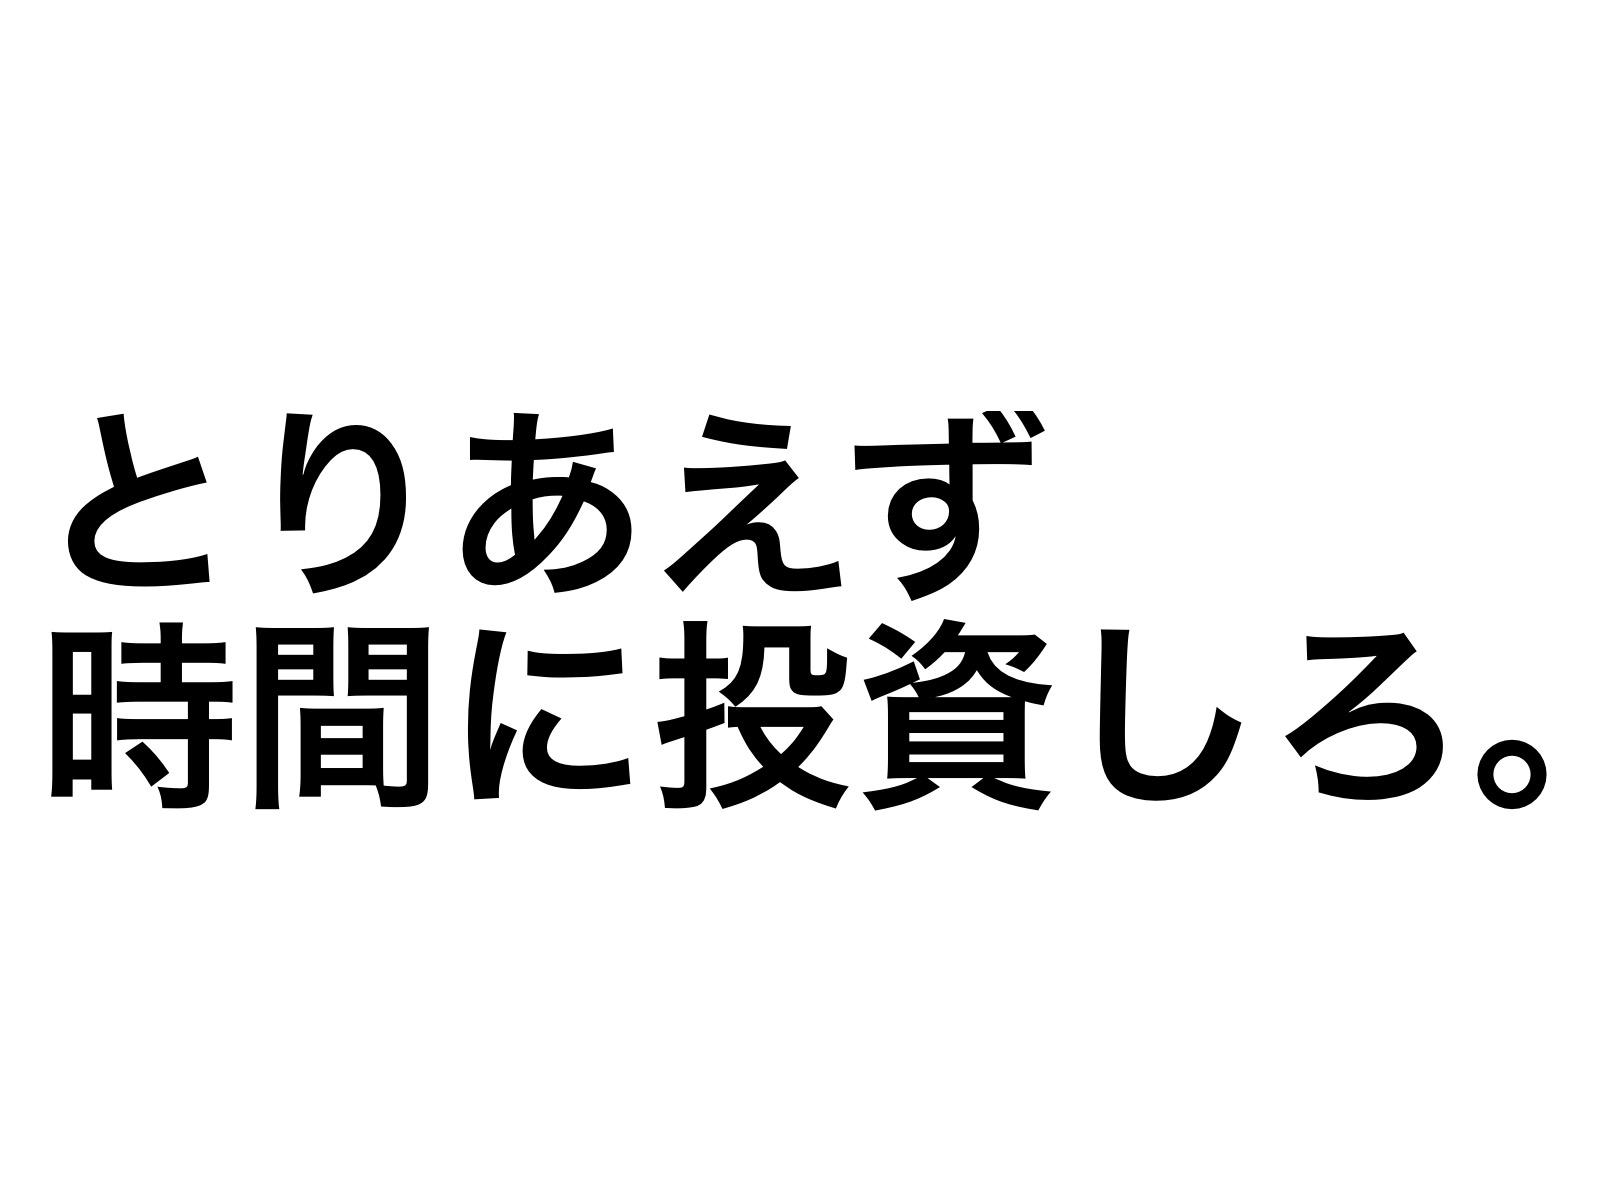 2017 03 30 22 48 20